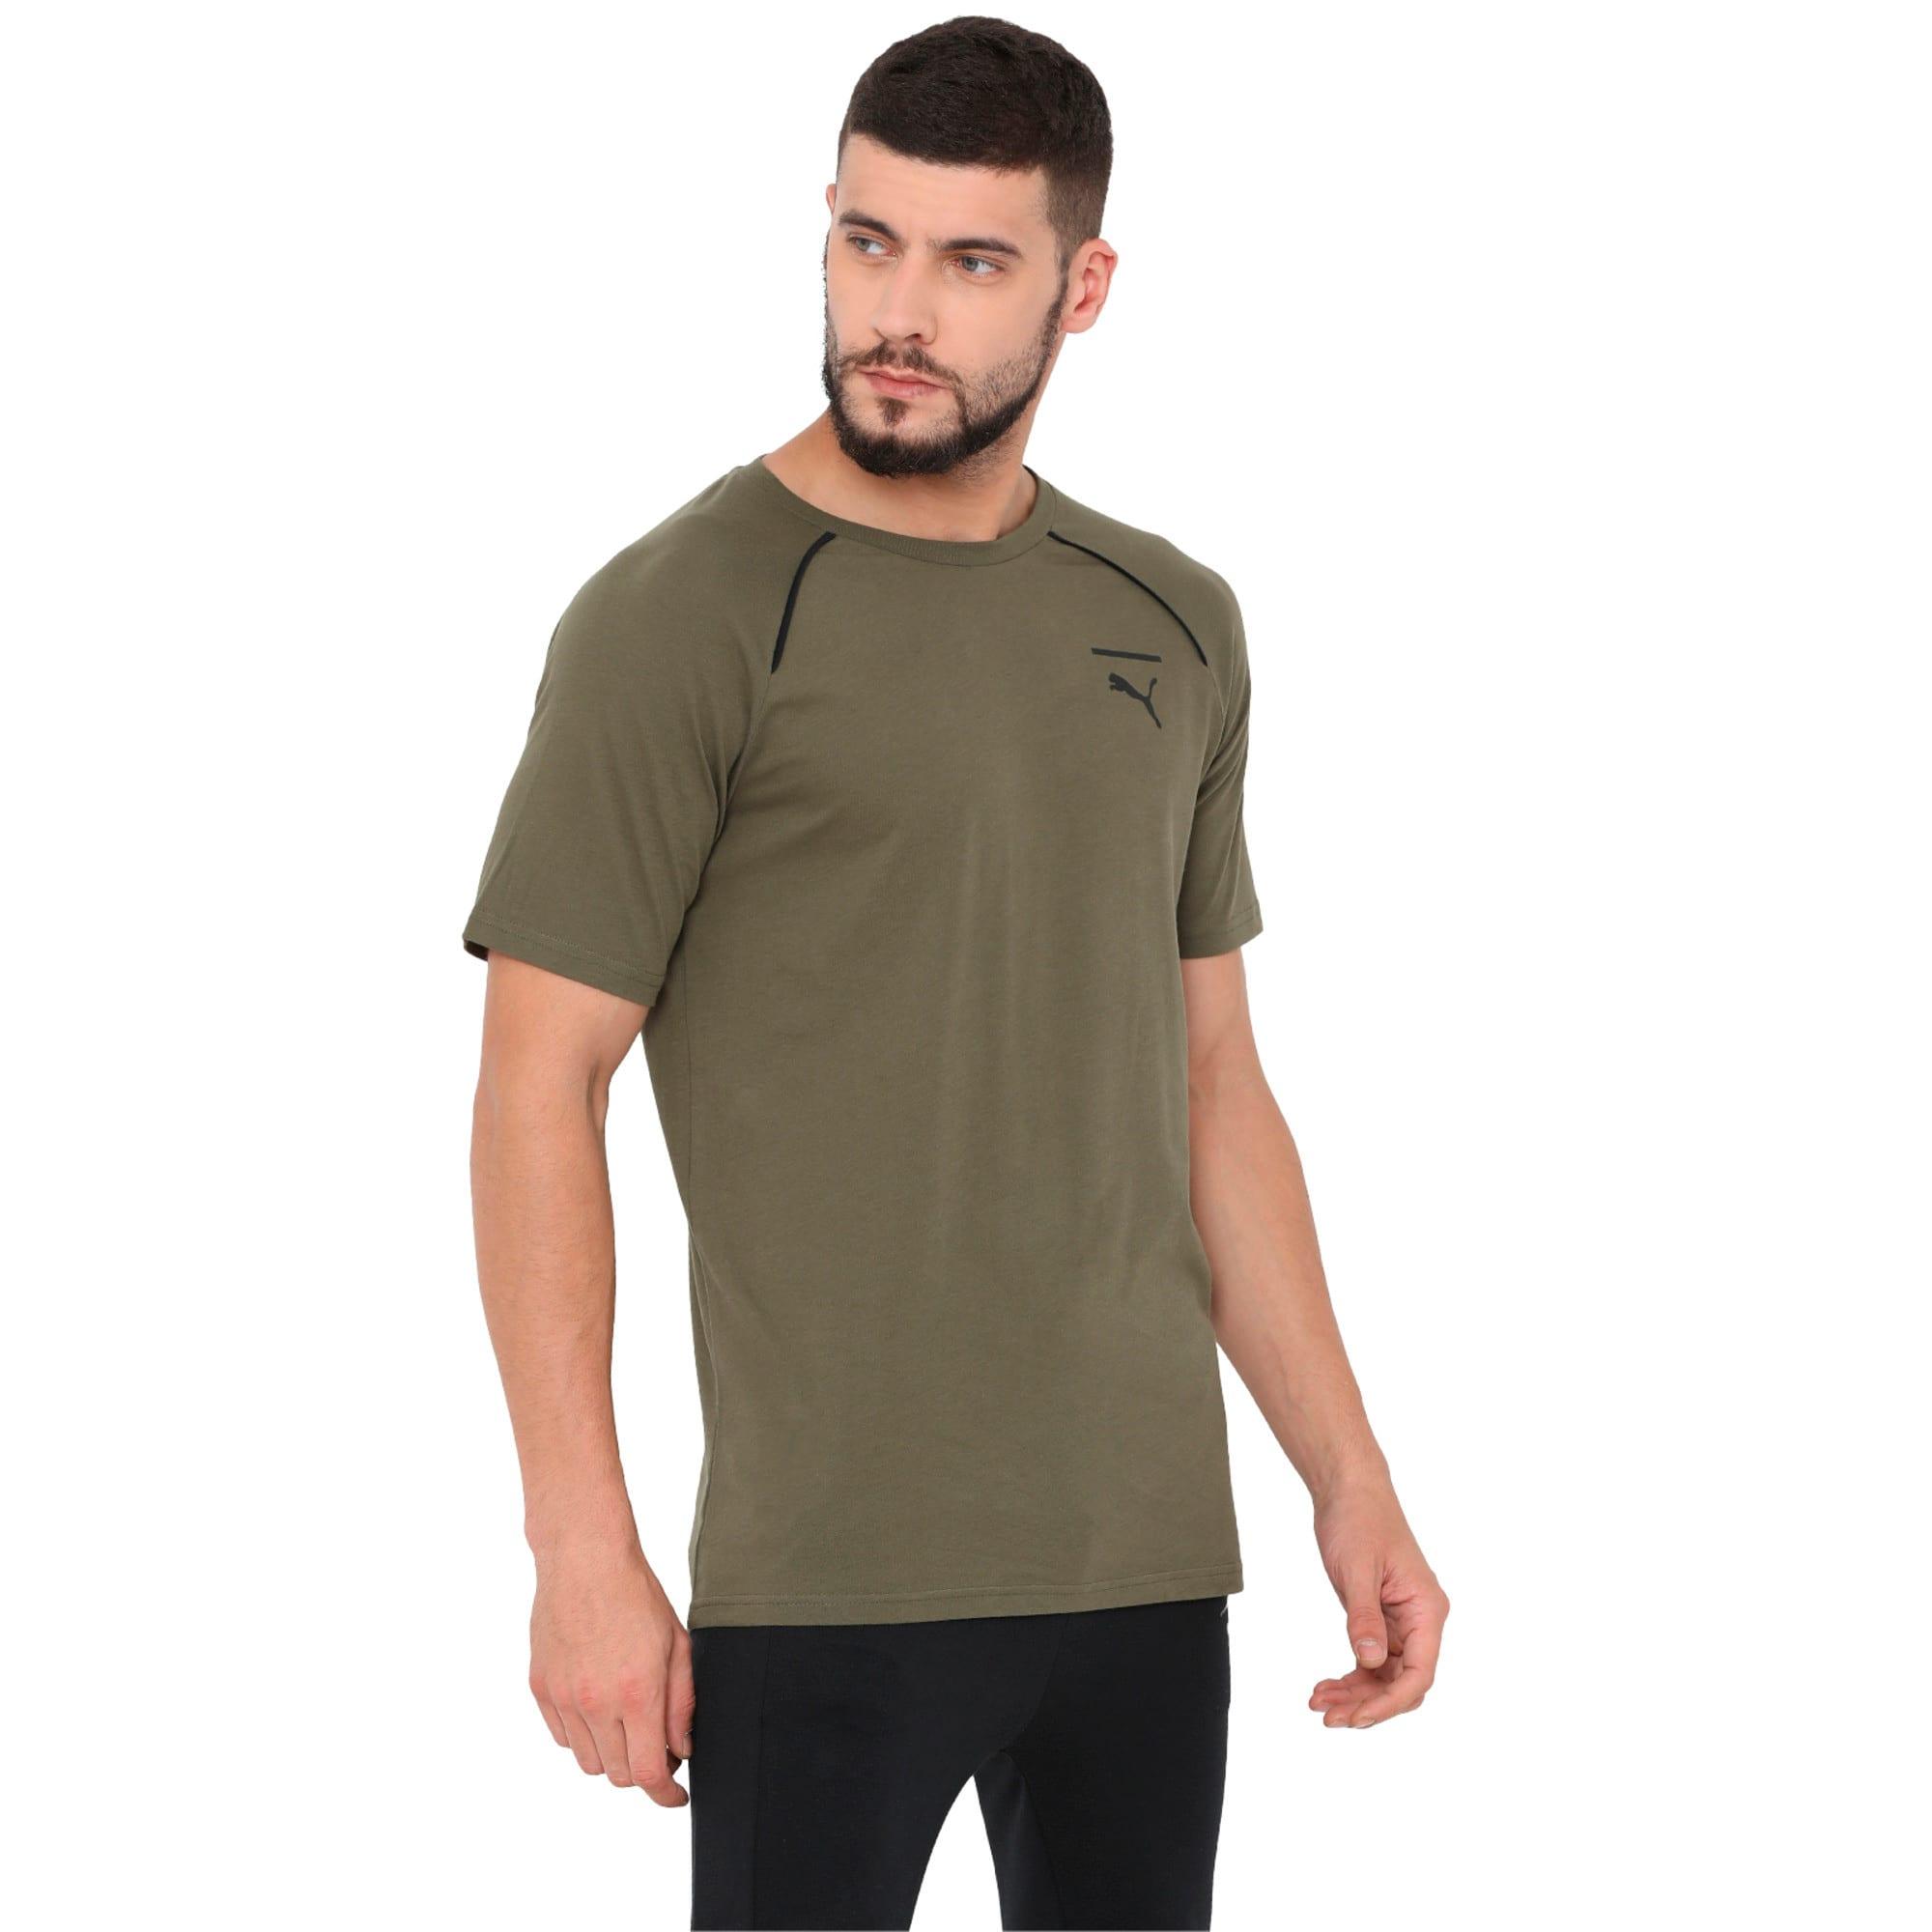 Thumbnail 1 of Evolution Men's Core T-Shirt, Olive Night, medium-IND